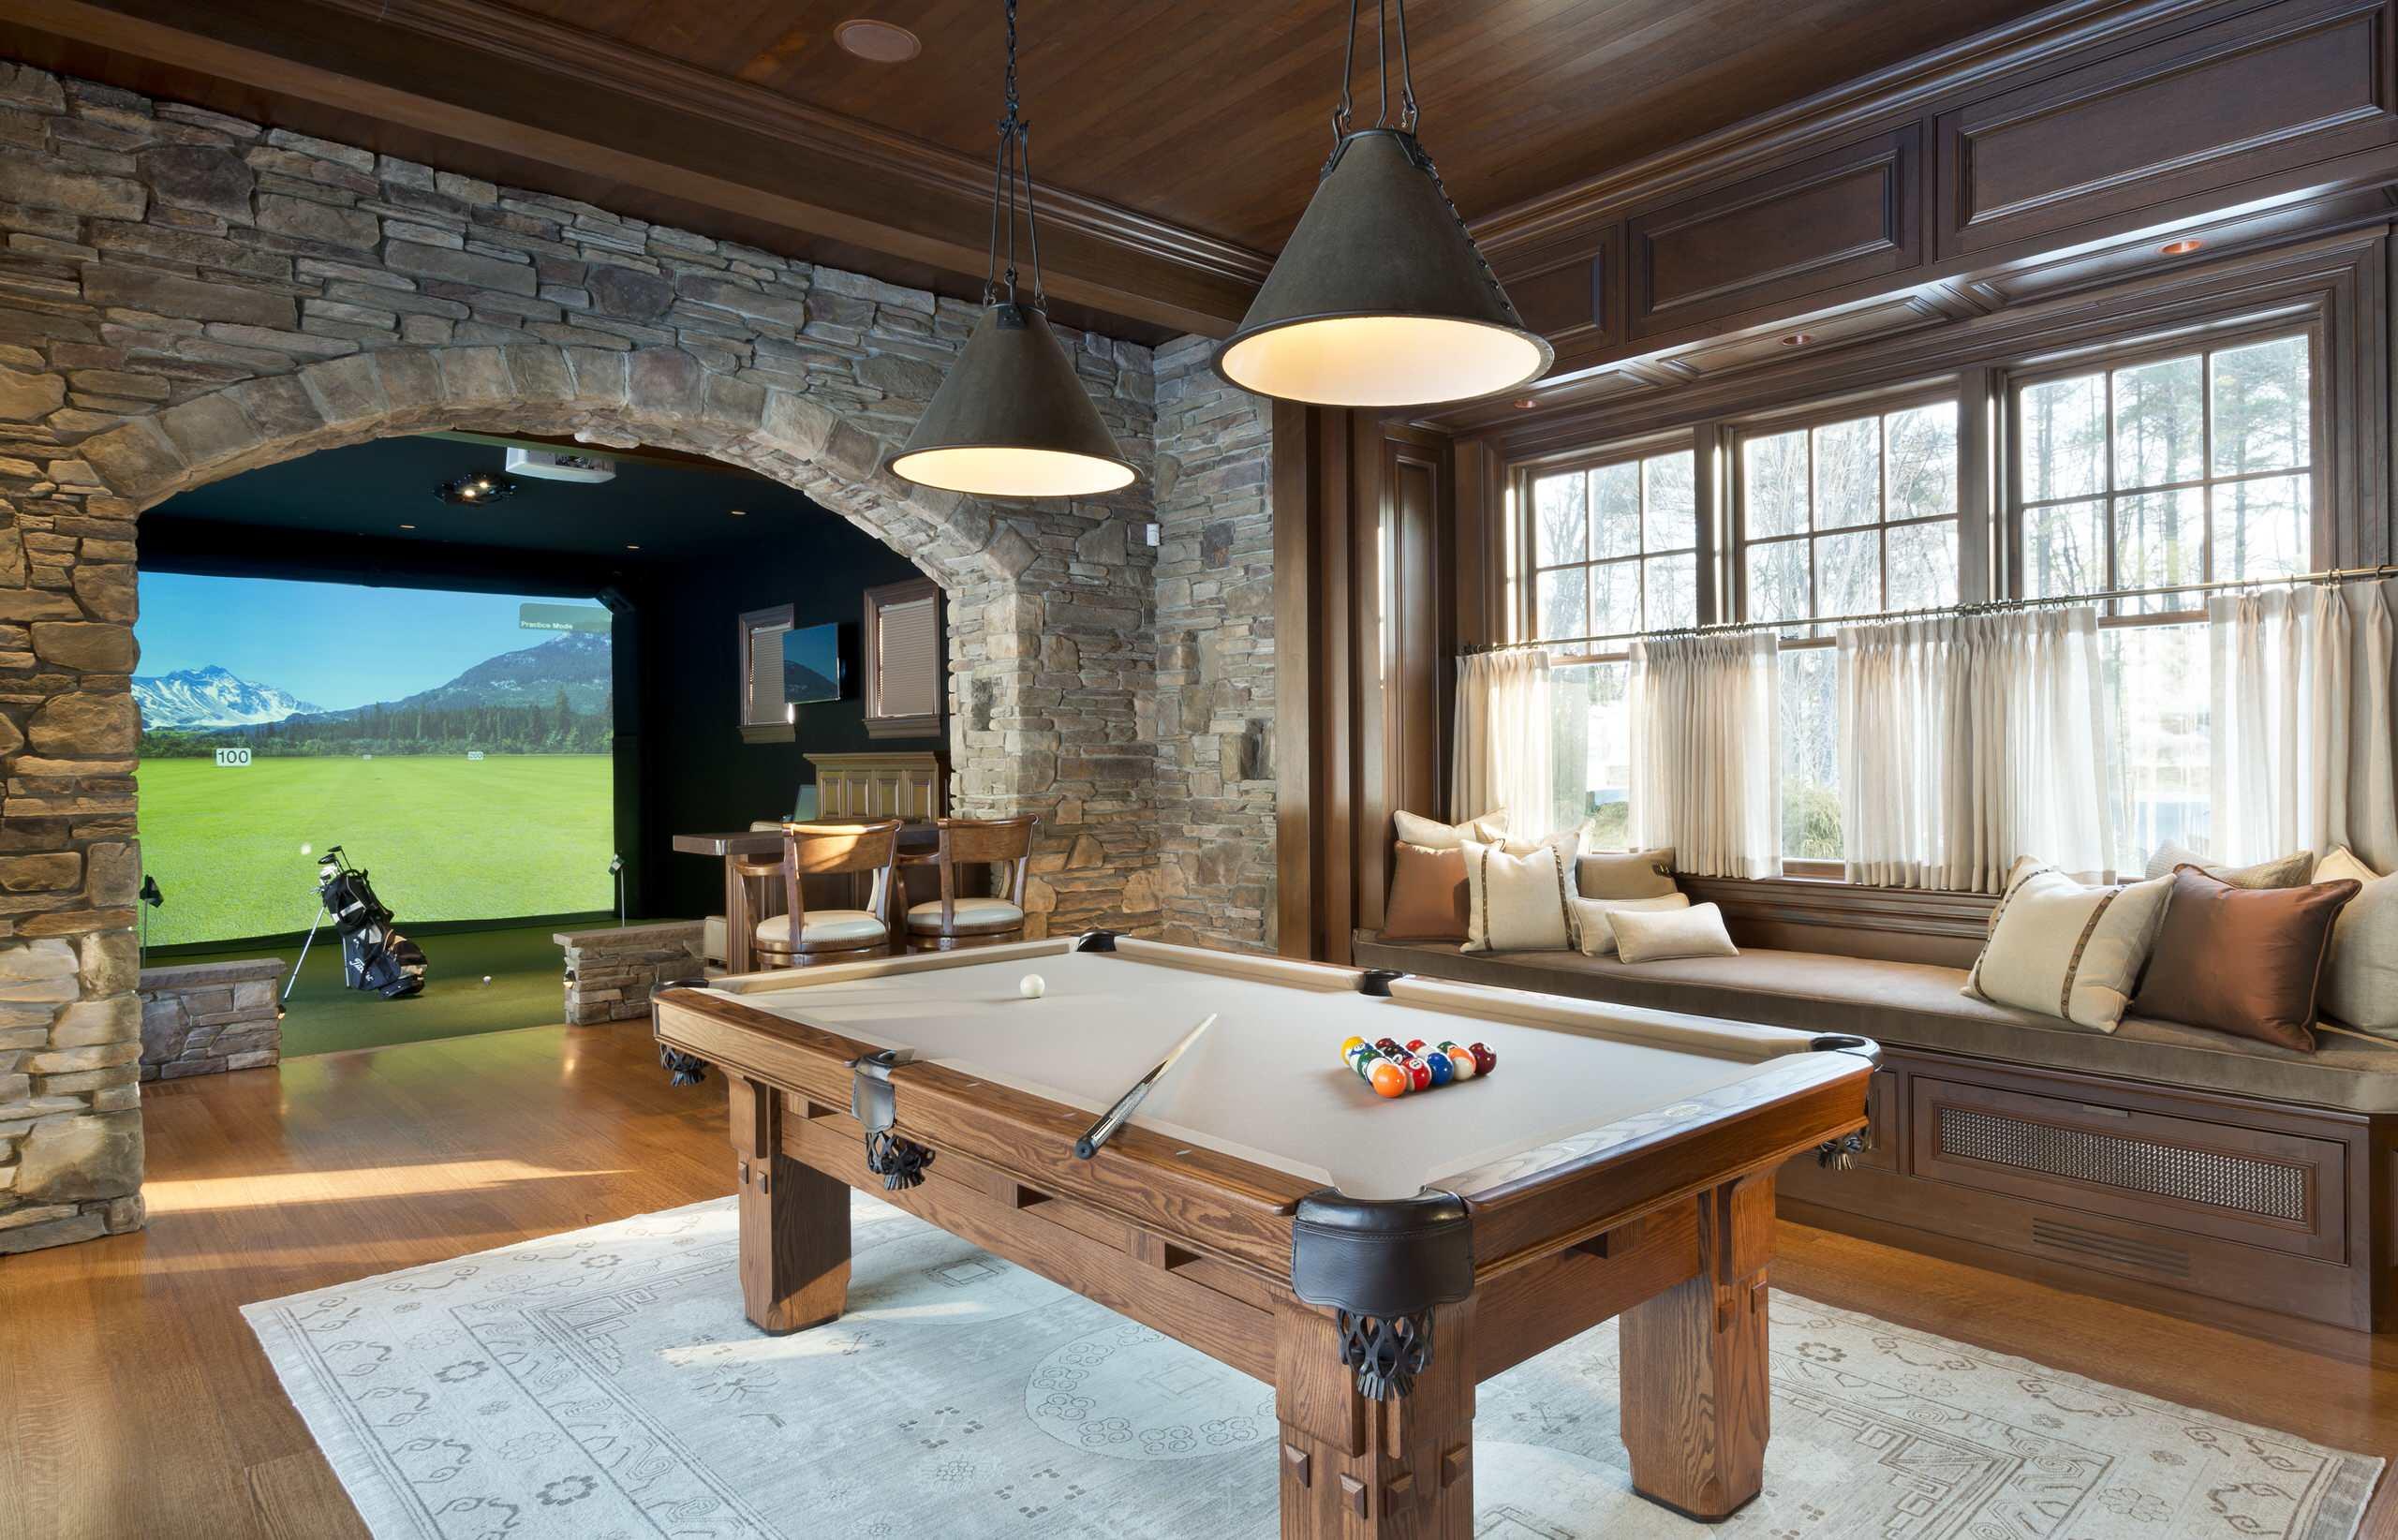 Golf Simulation Room Houzz